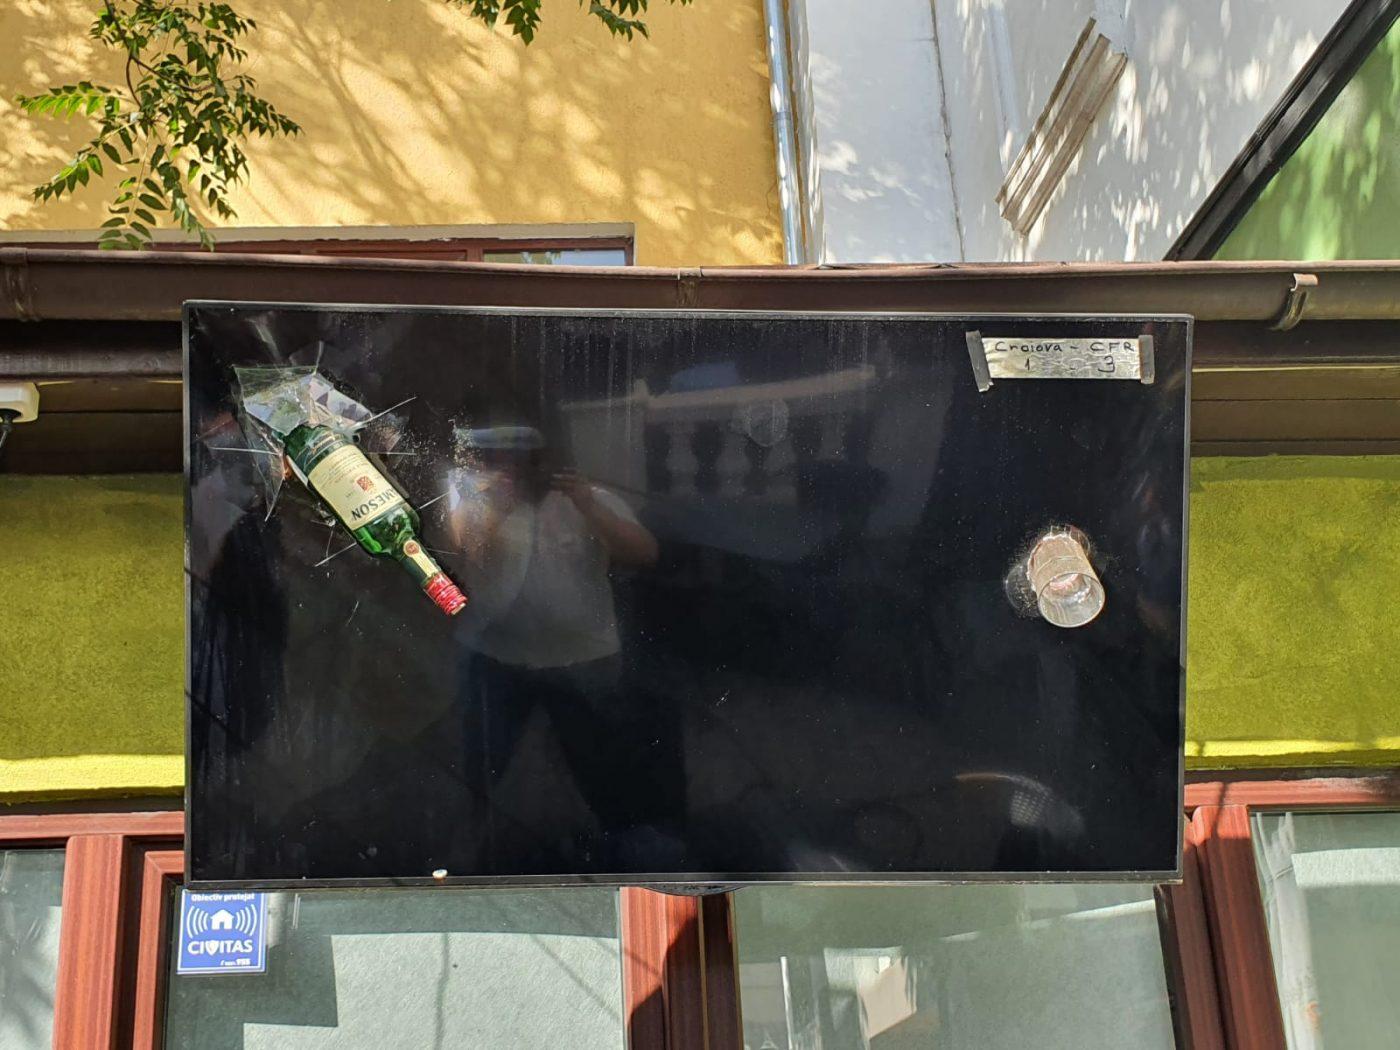 tv peluza nord universitatea craiova titlu raspuns bergodi